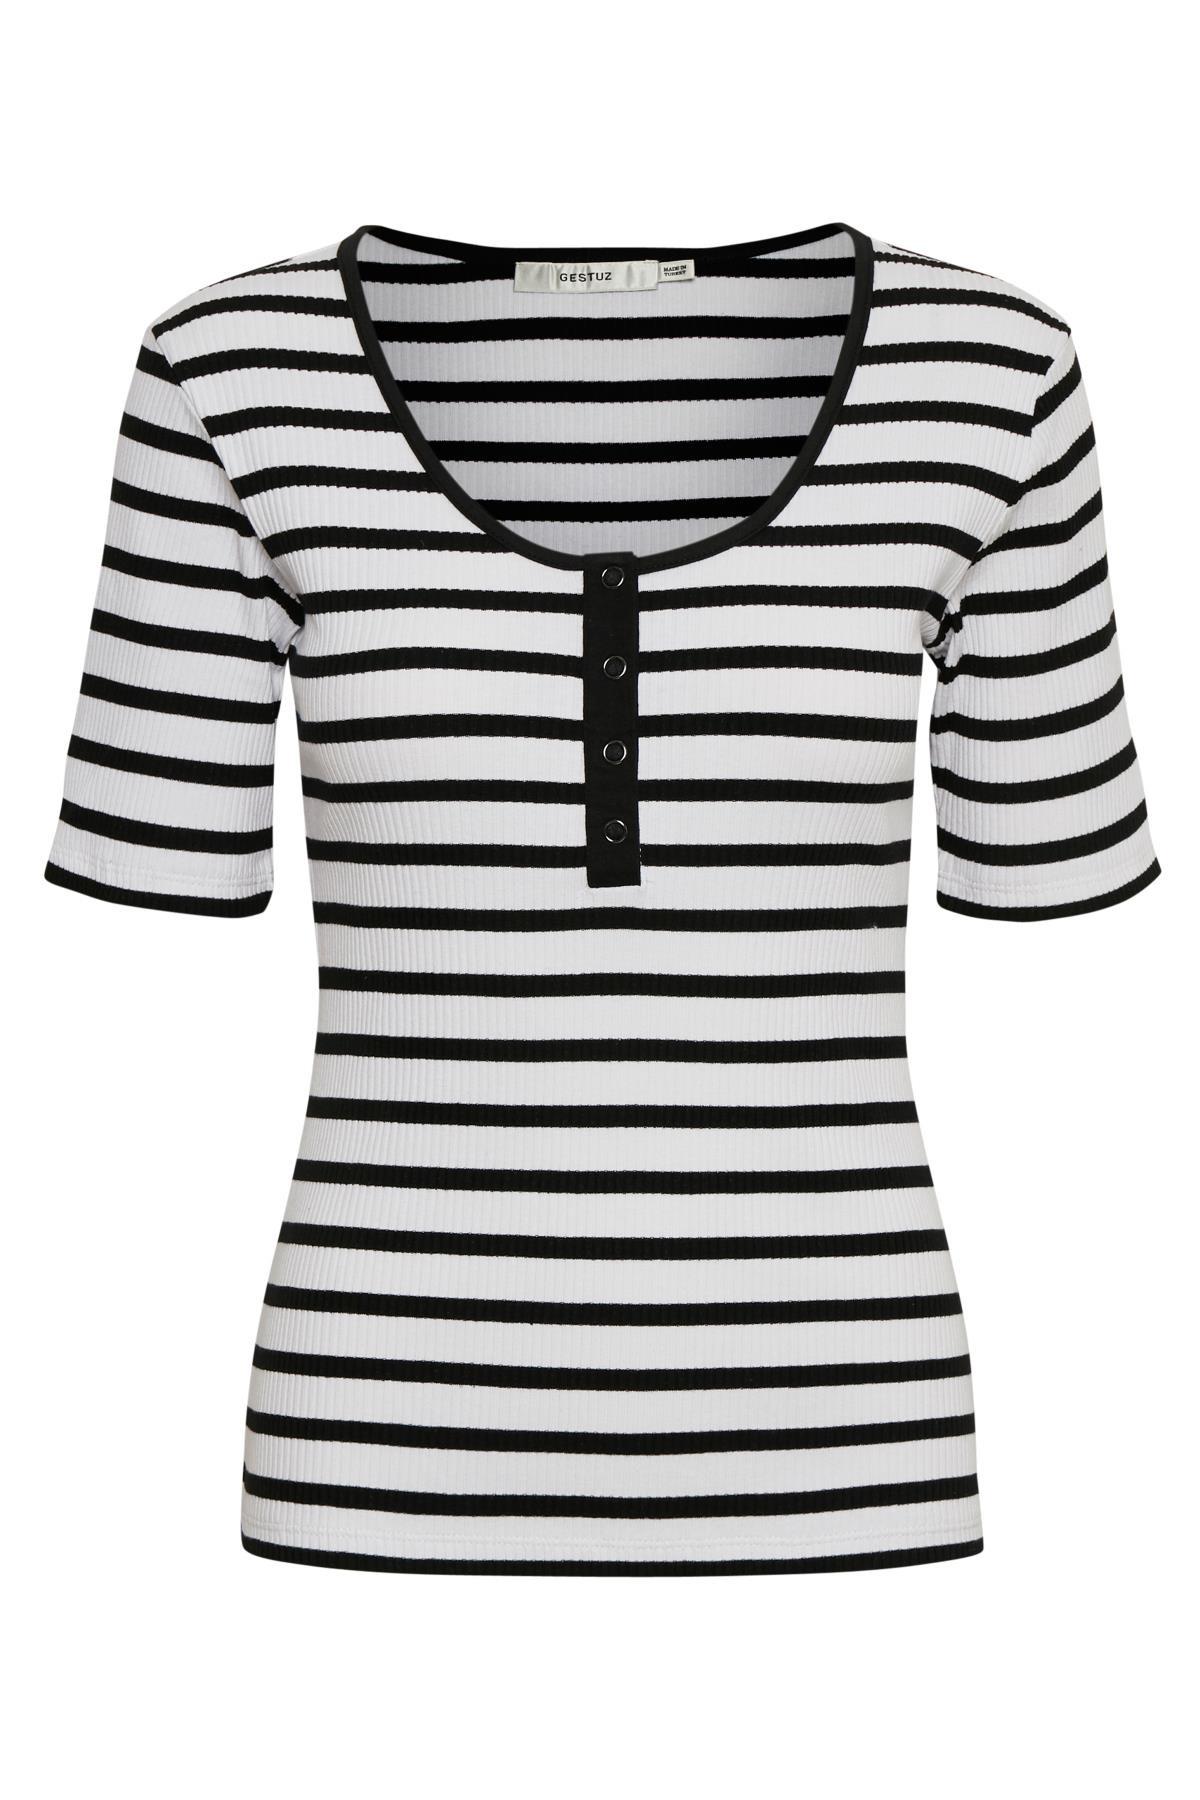 Image of   GESTUZ REGGGZ TEE (White W. Black Stripes 90142, XS)